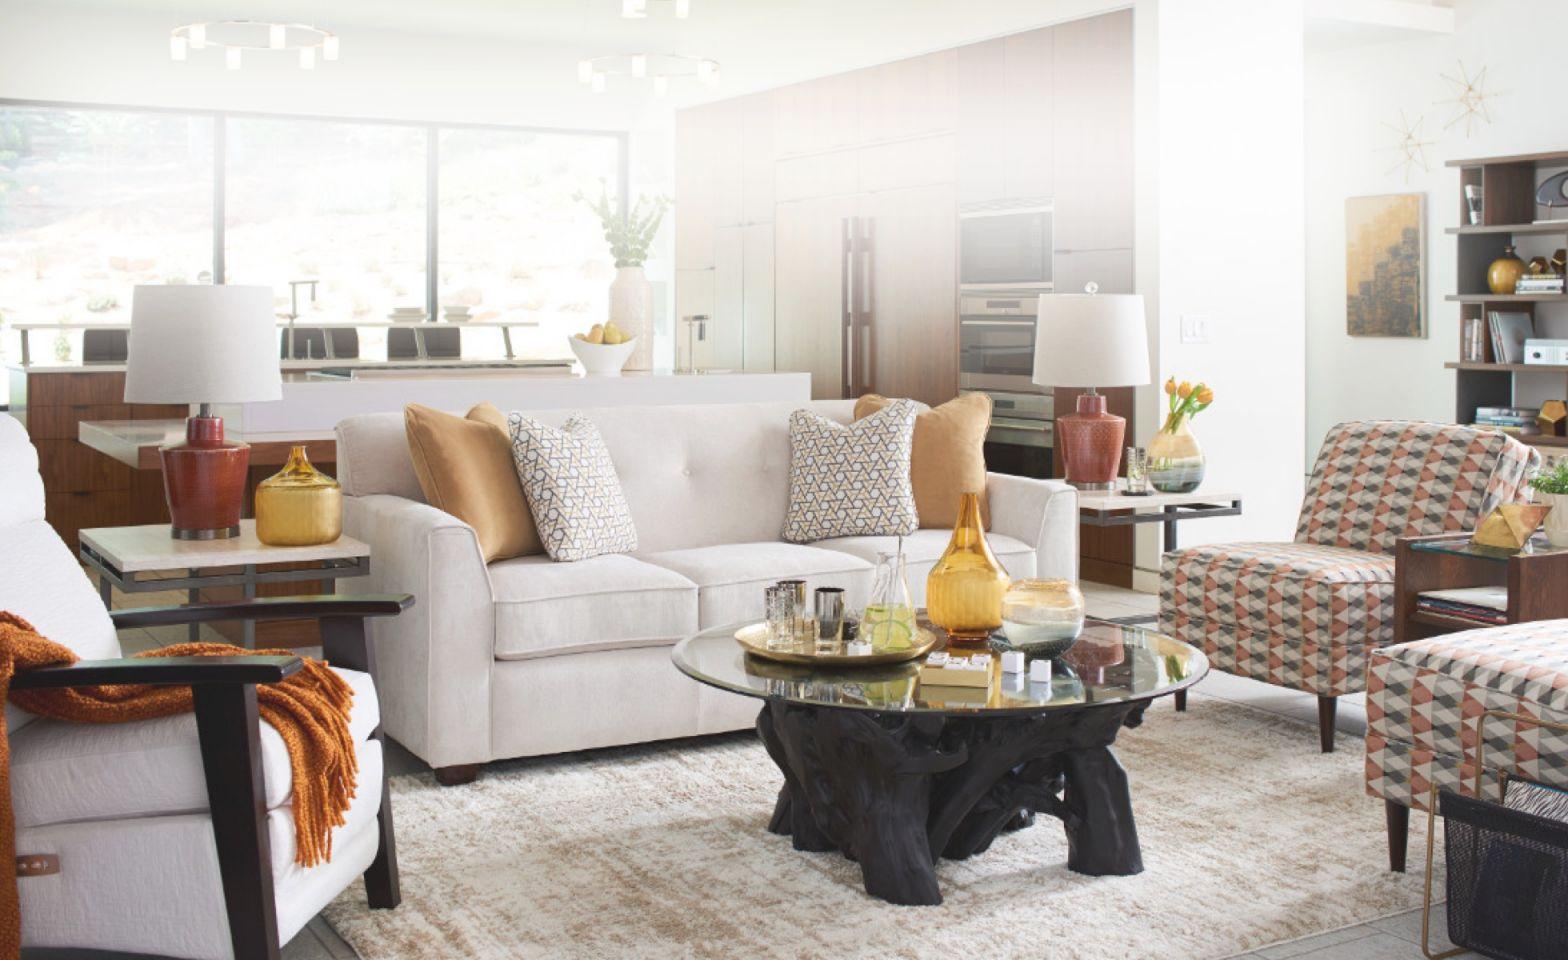 Modern Retreat   La-Z-Boy intended for New Lazy Boy Living Room Furniture